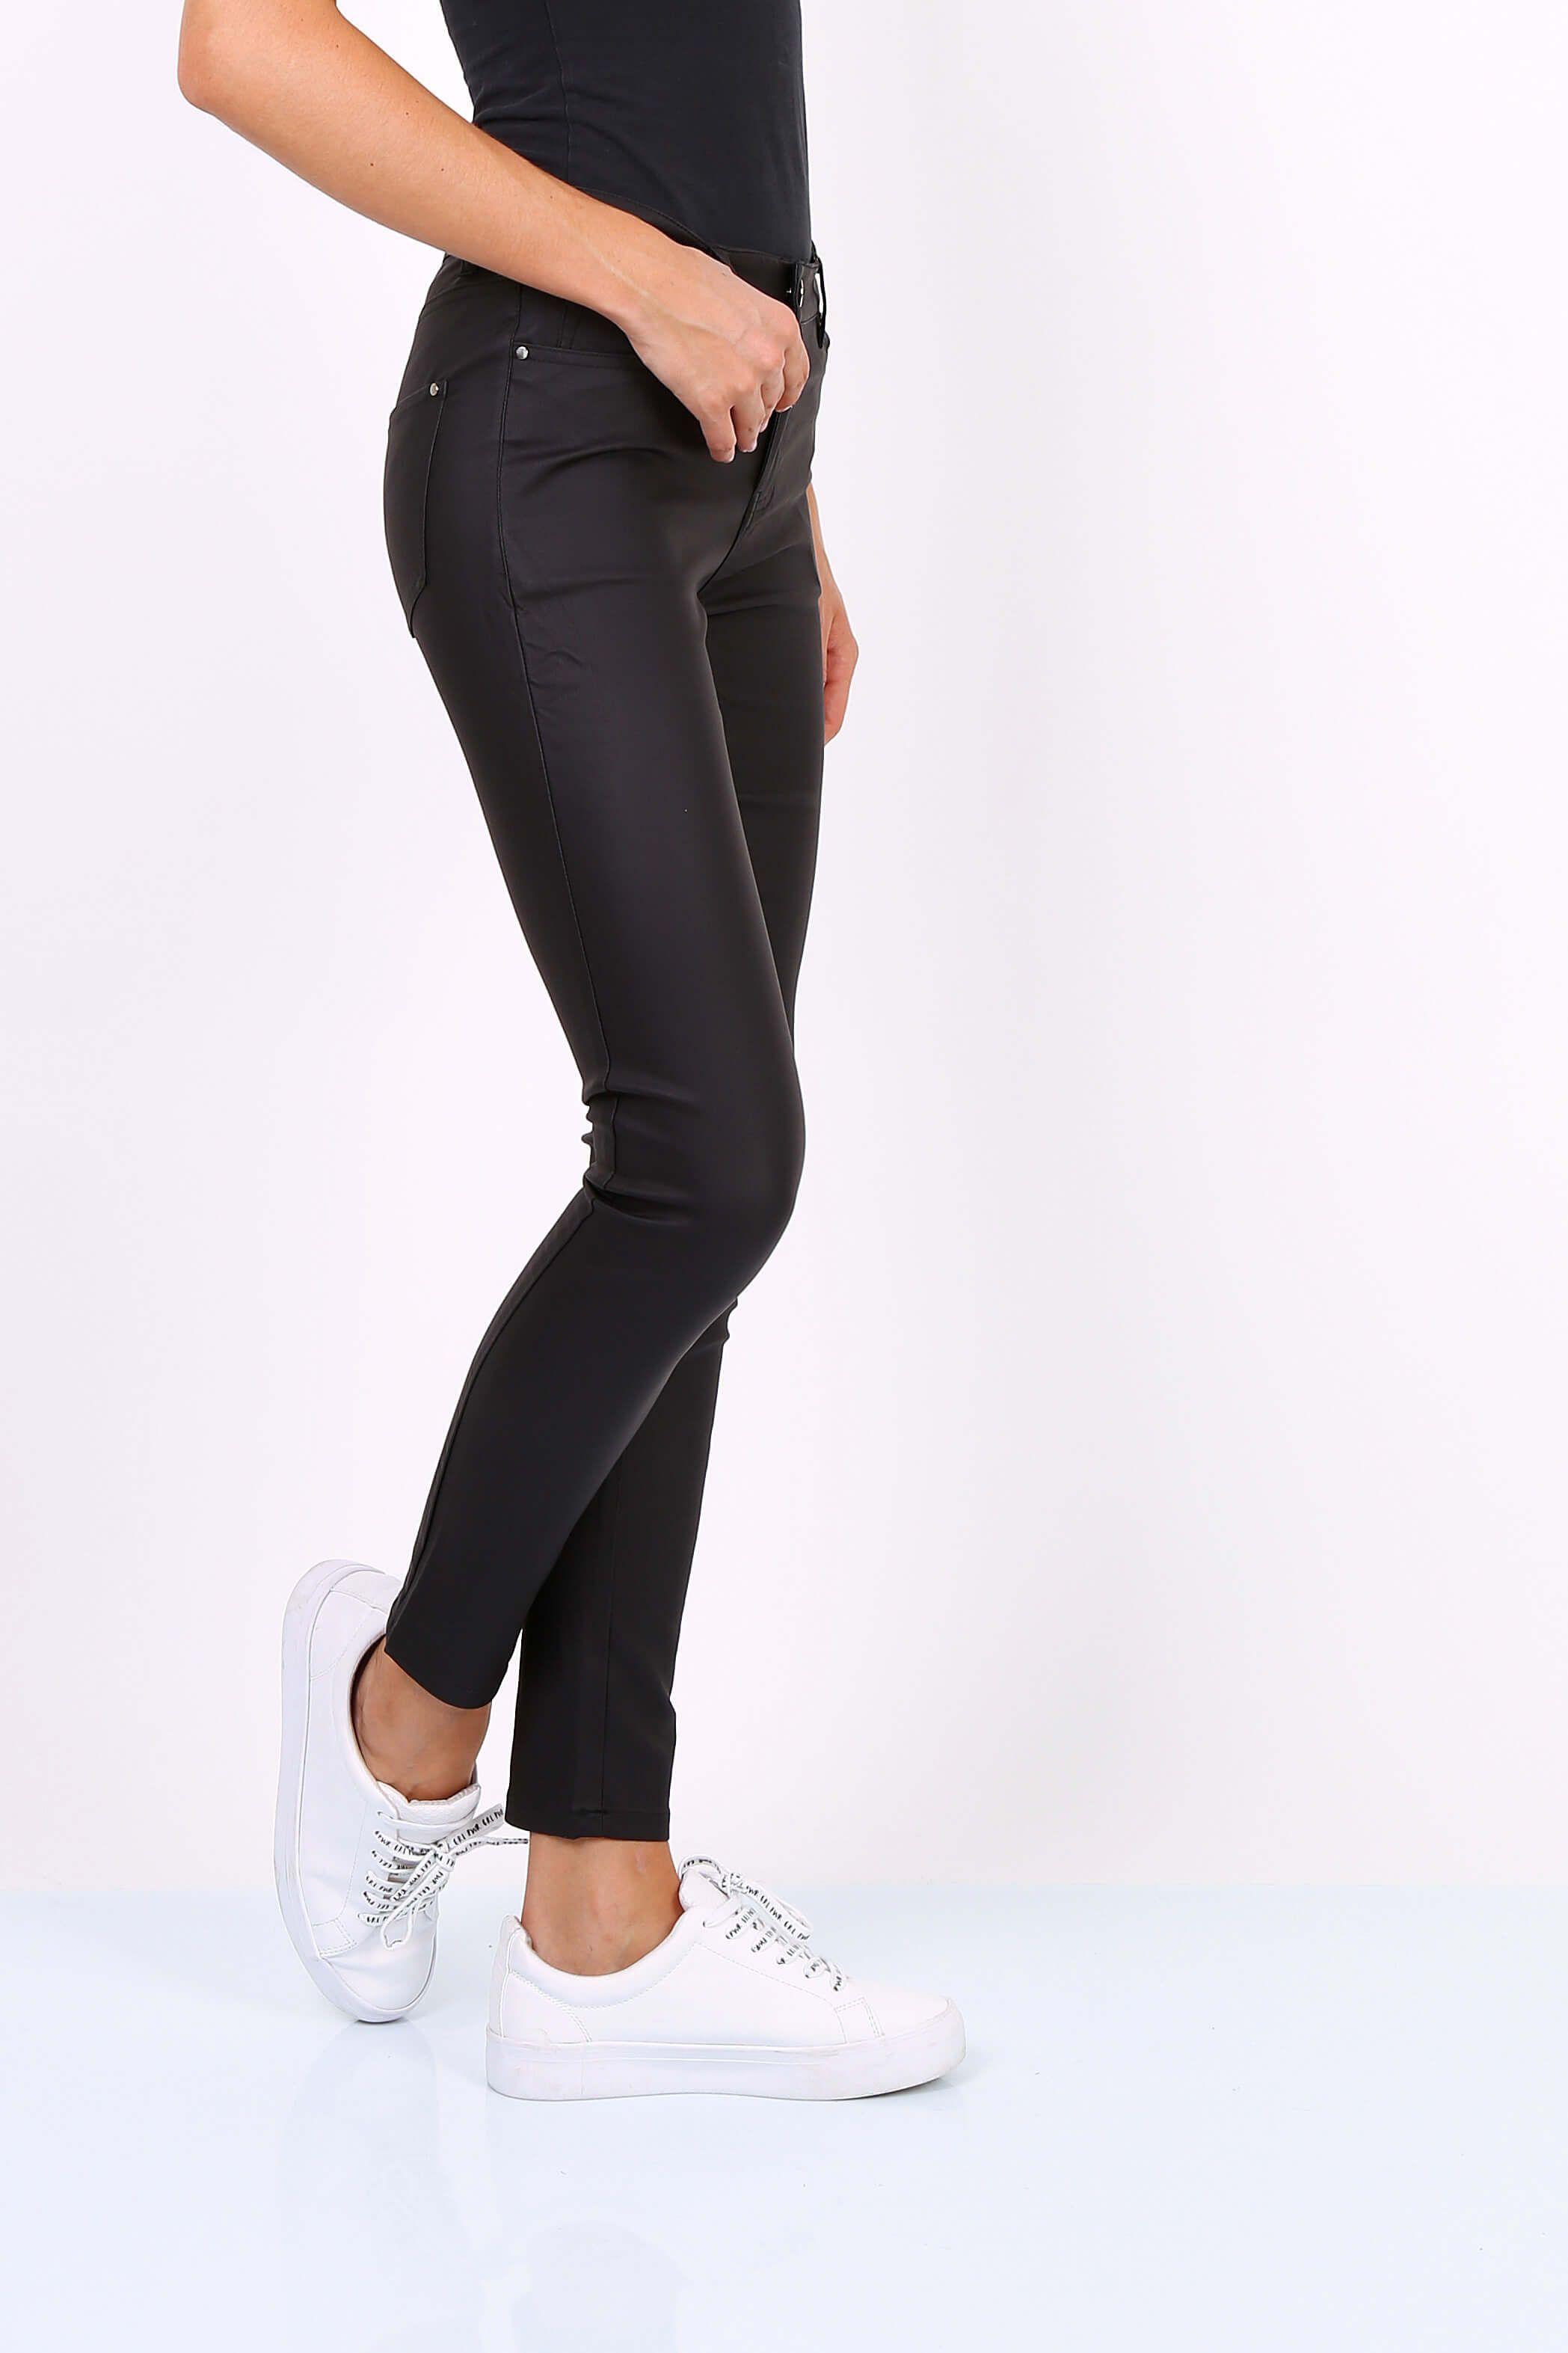 d0134462db98 Dámske čierne elastické nohavice